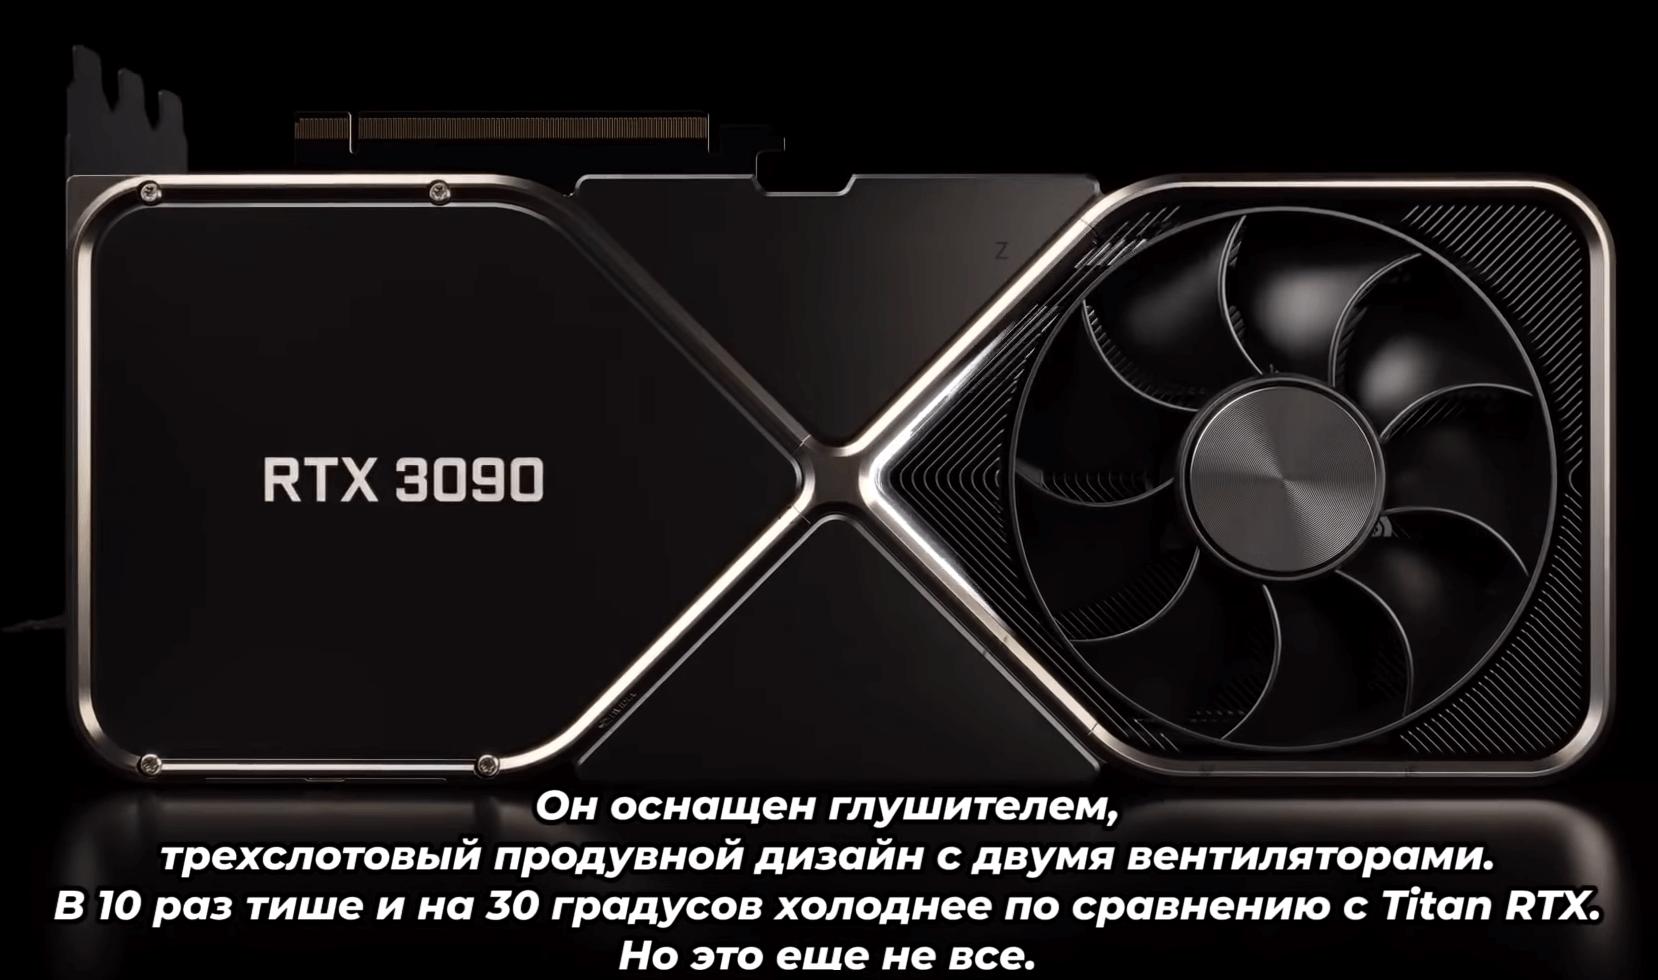 Встречаем RTX 3090